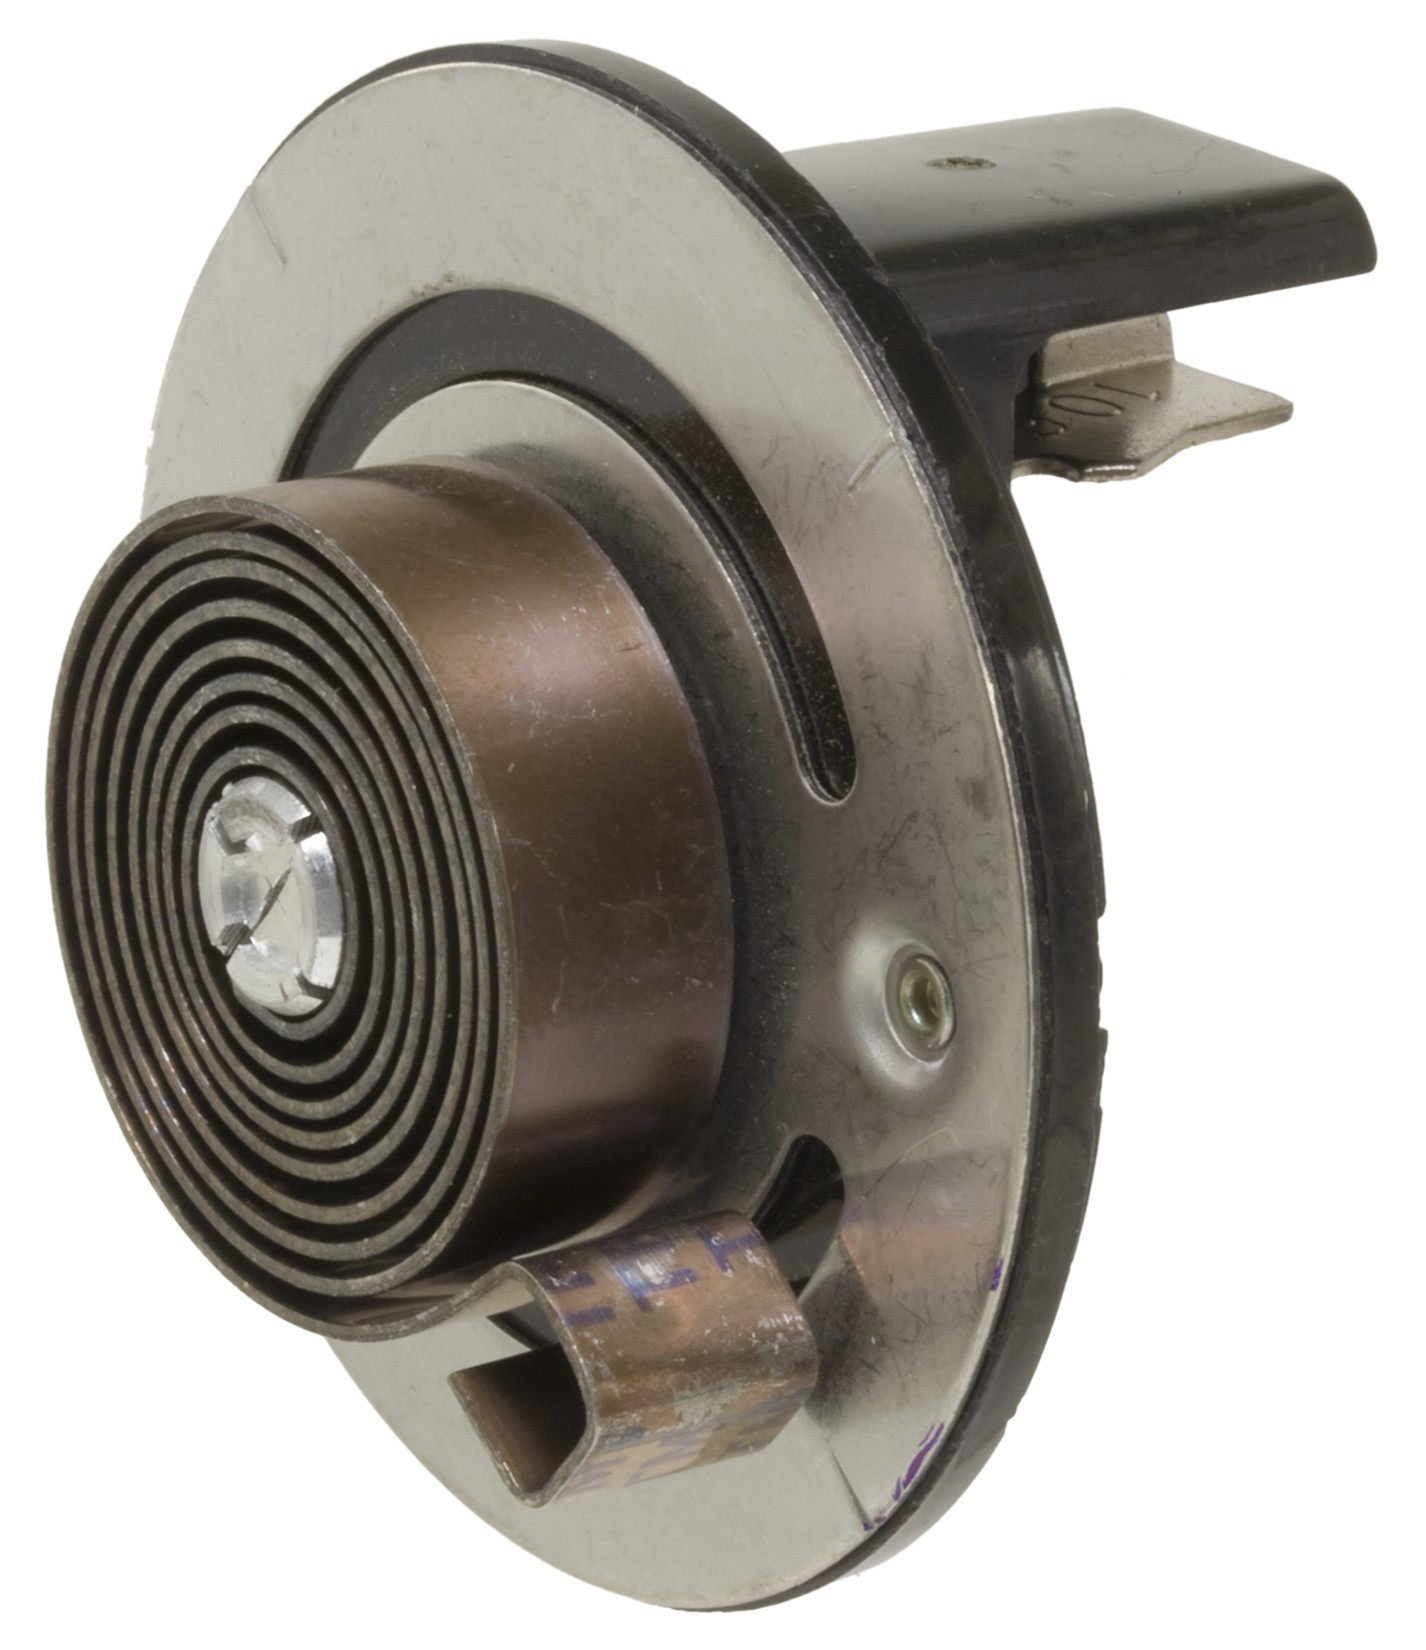 WELLS - Carburetor Choke Thermostat - WEL E696